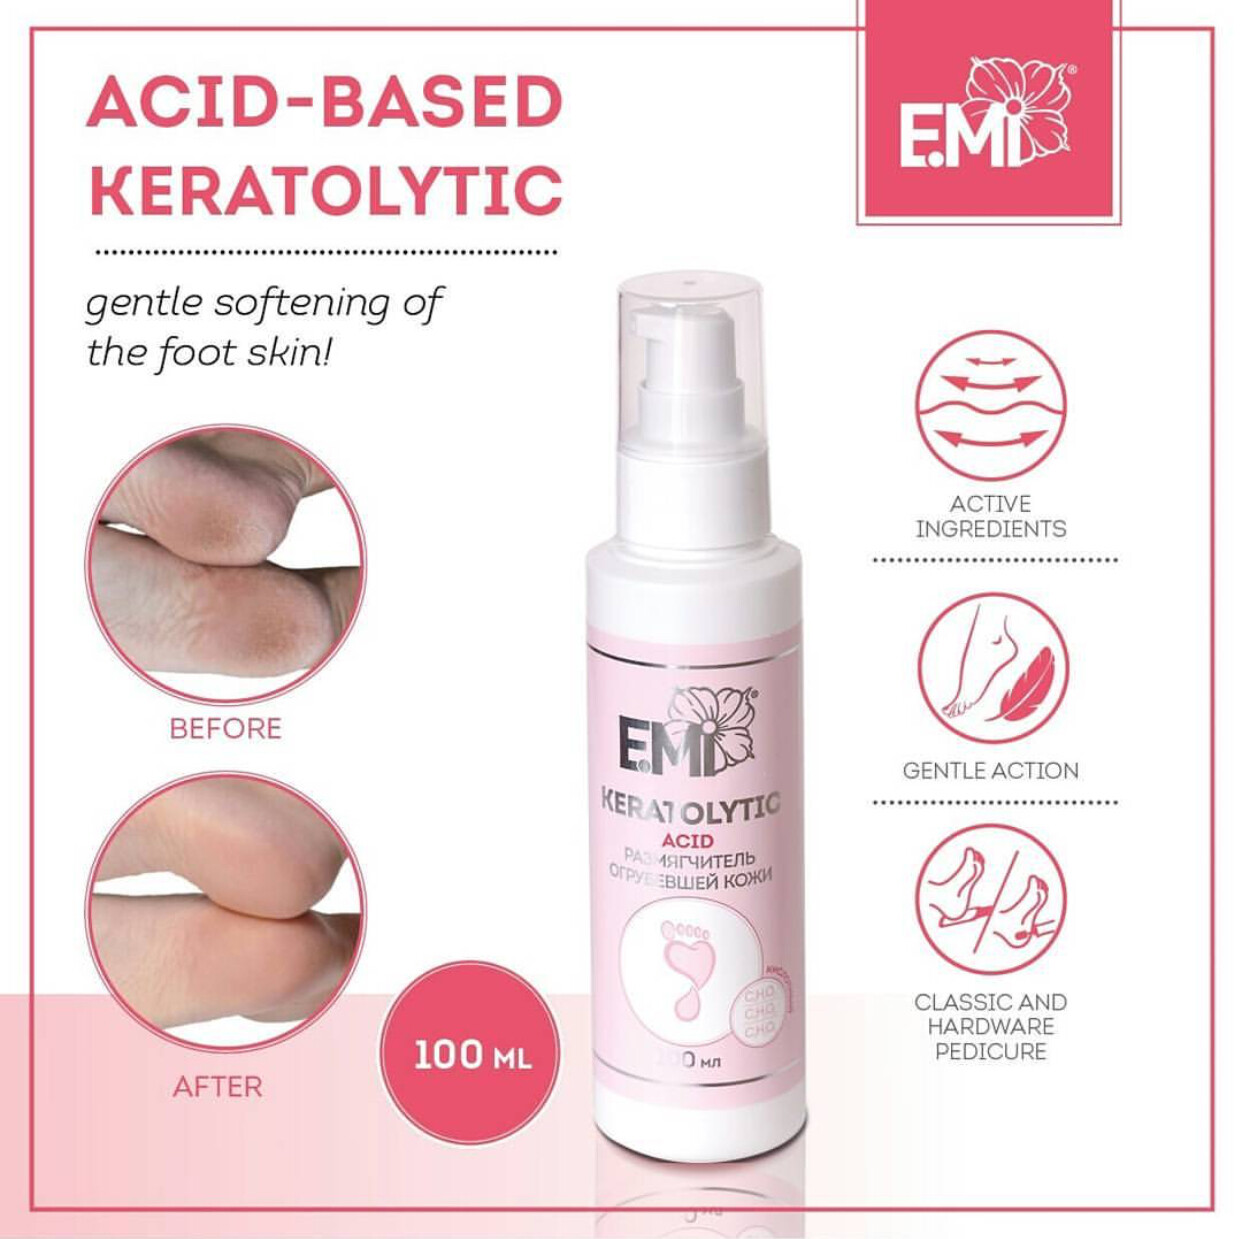 Acid-Based Keratolytic – Rough Skin Softener based on acids: citric, tartaric and lactic, 30 or 100 ml